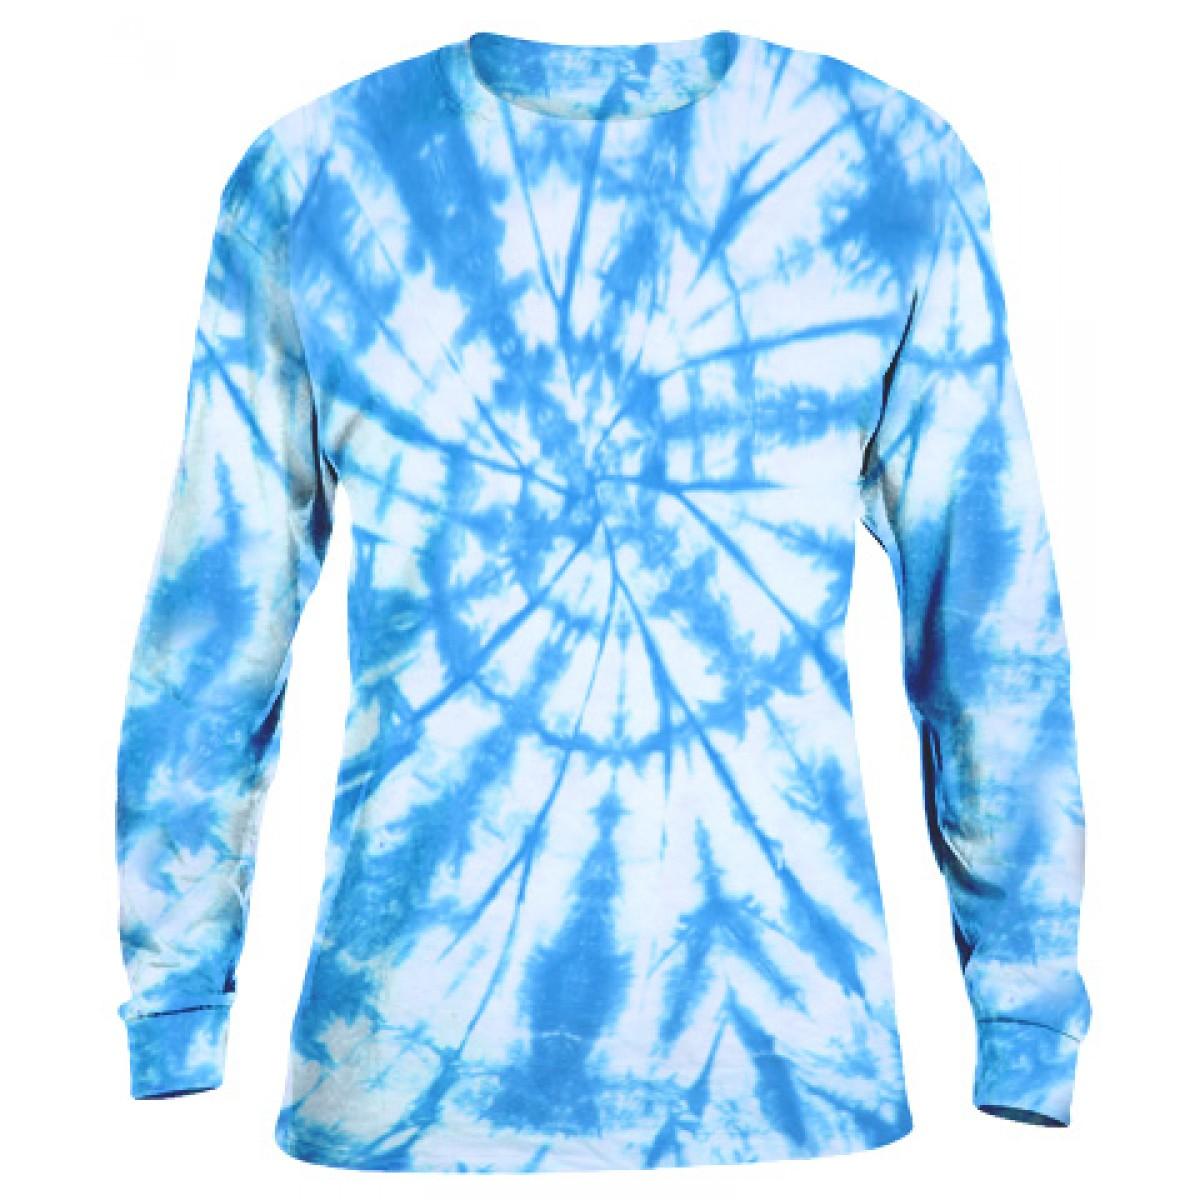 Tie-Dye Long Sleeve Shirt -Blue-YS